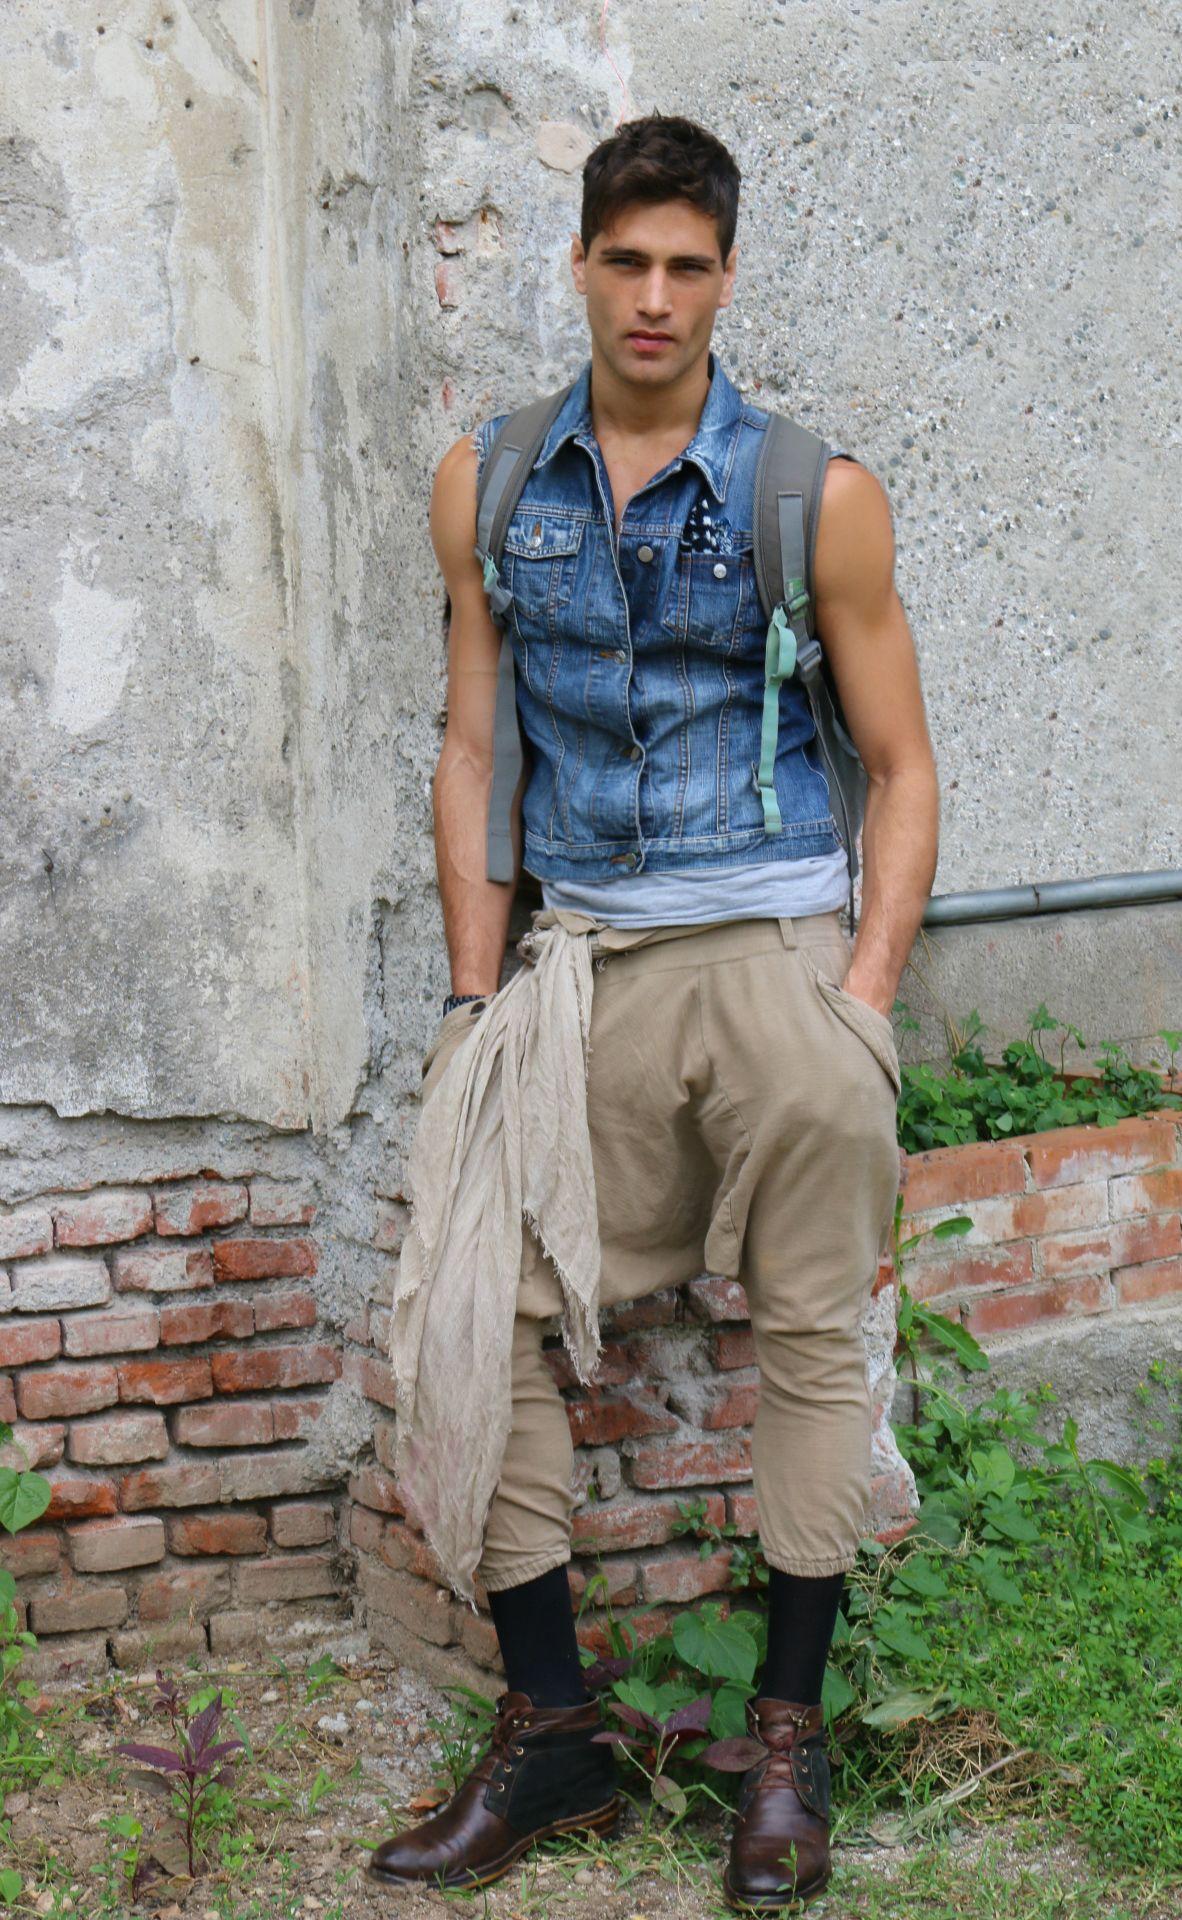 Fabio Mancini Blog   fabio mancini, armani, model, italian   Page 2